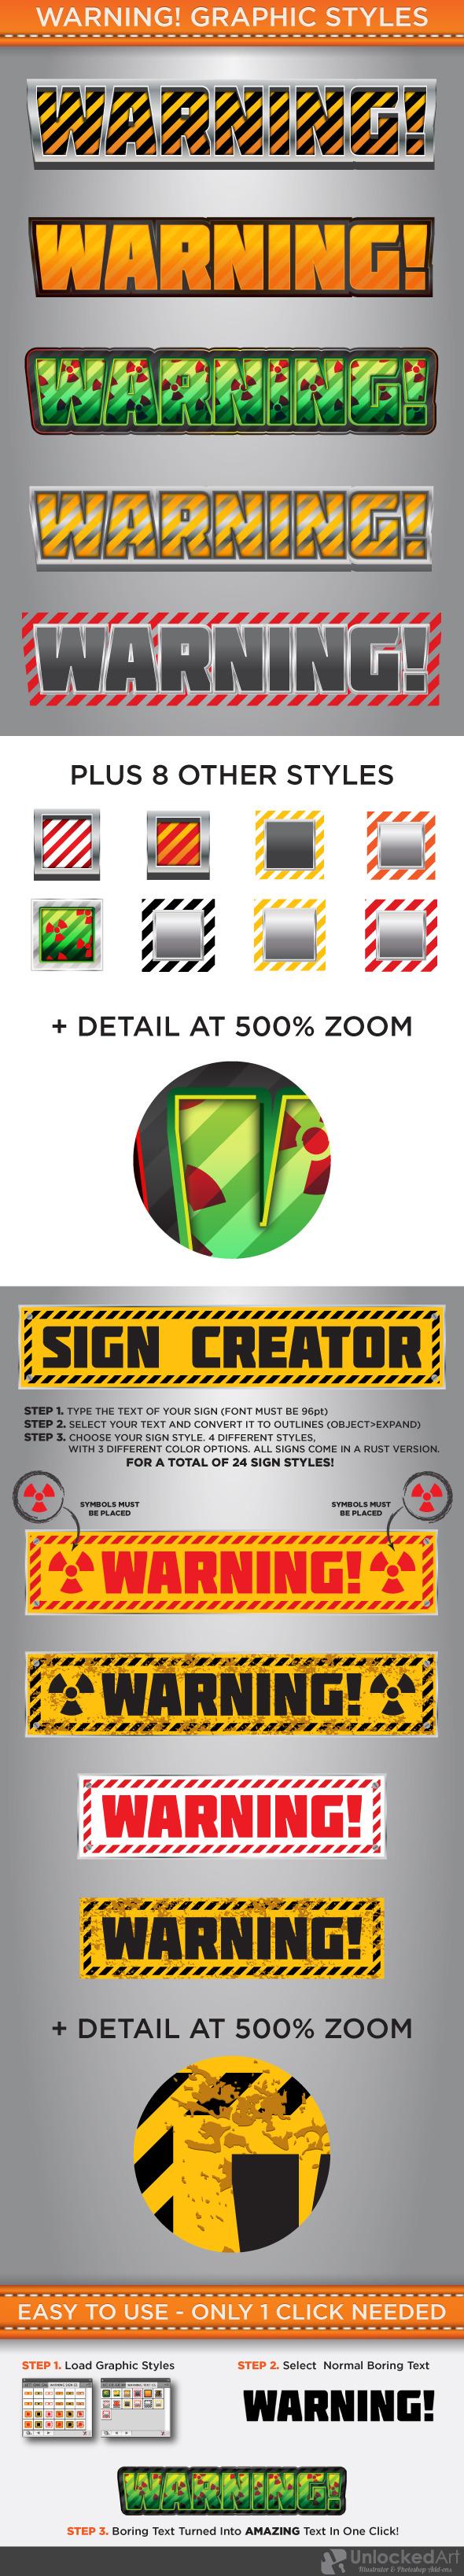 Warning Graphic Styles - Styles Illustrator